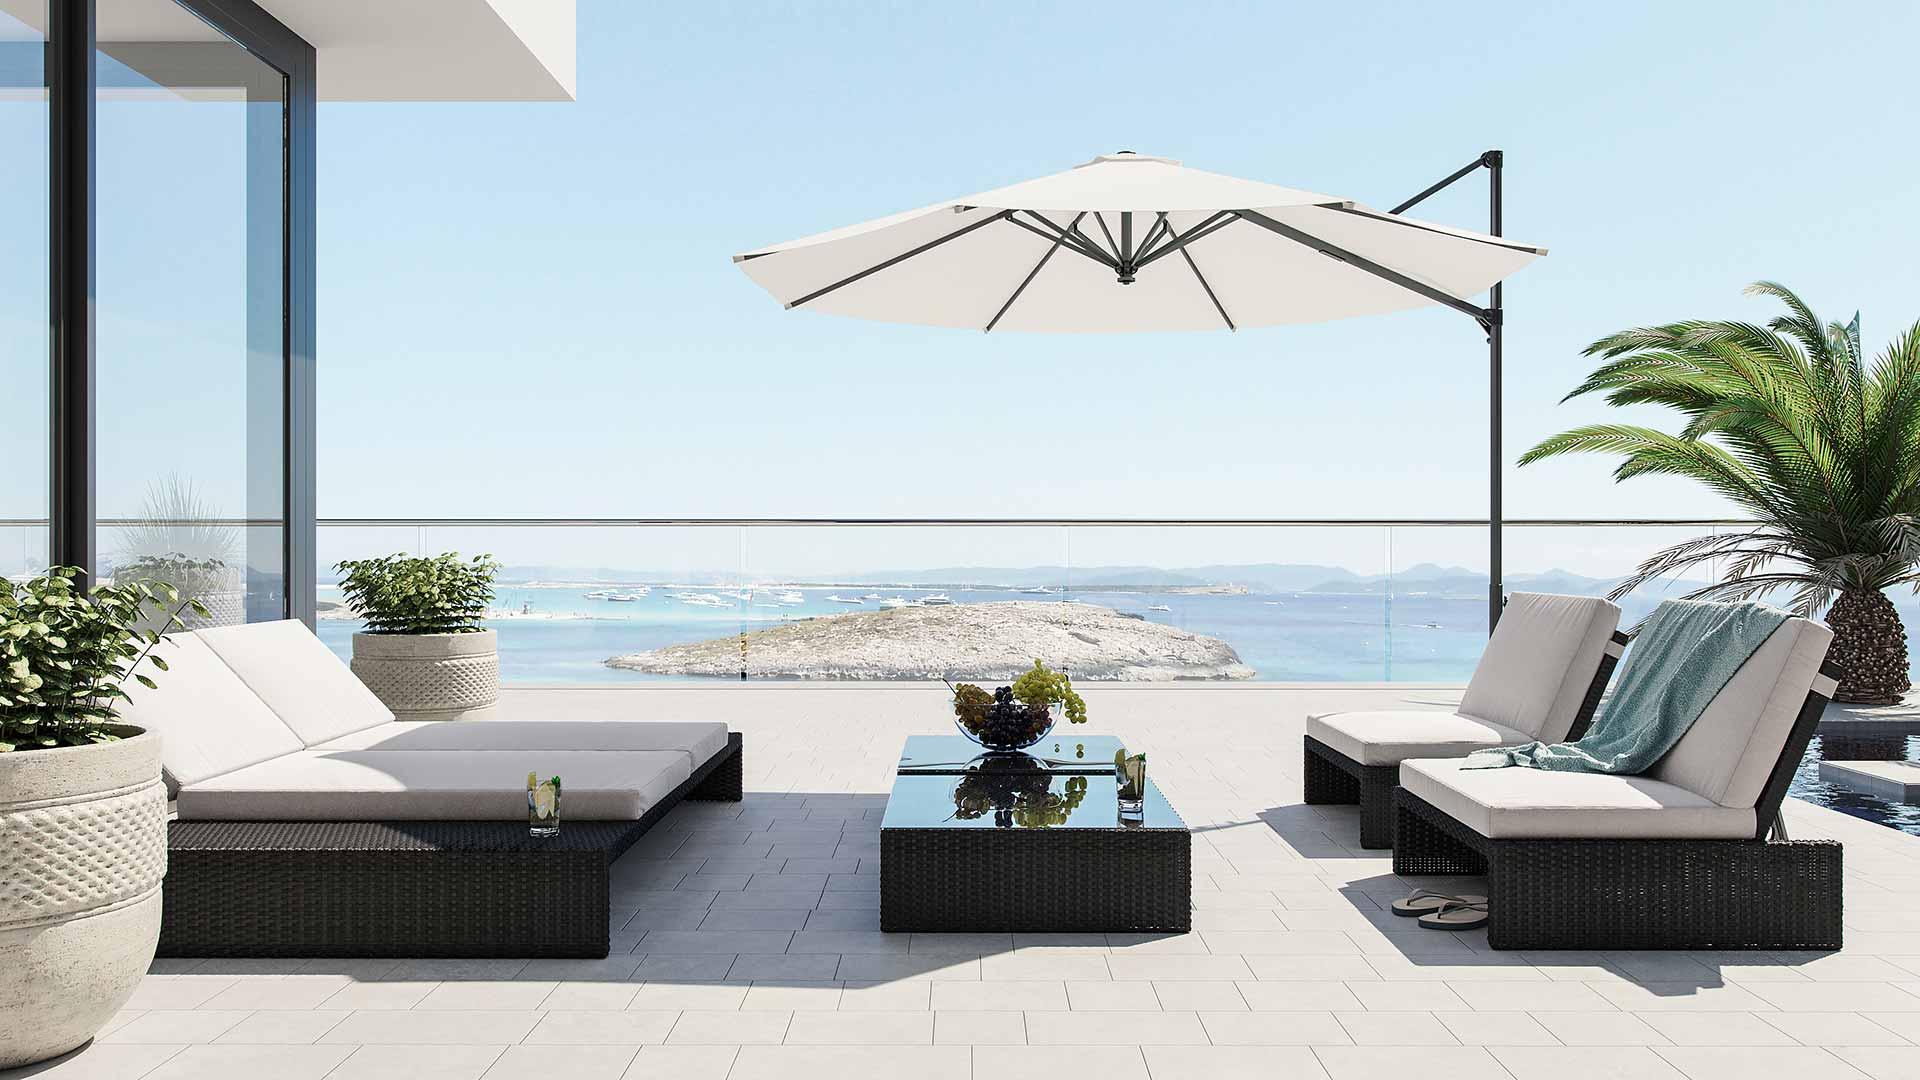 Artelia fr lounge salon de jardin en r sine tress e estoria for Artelia salon de jardin